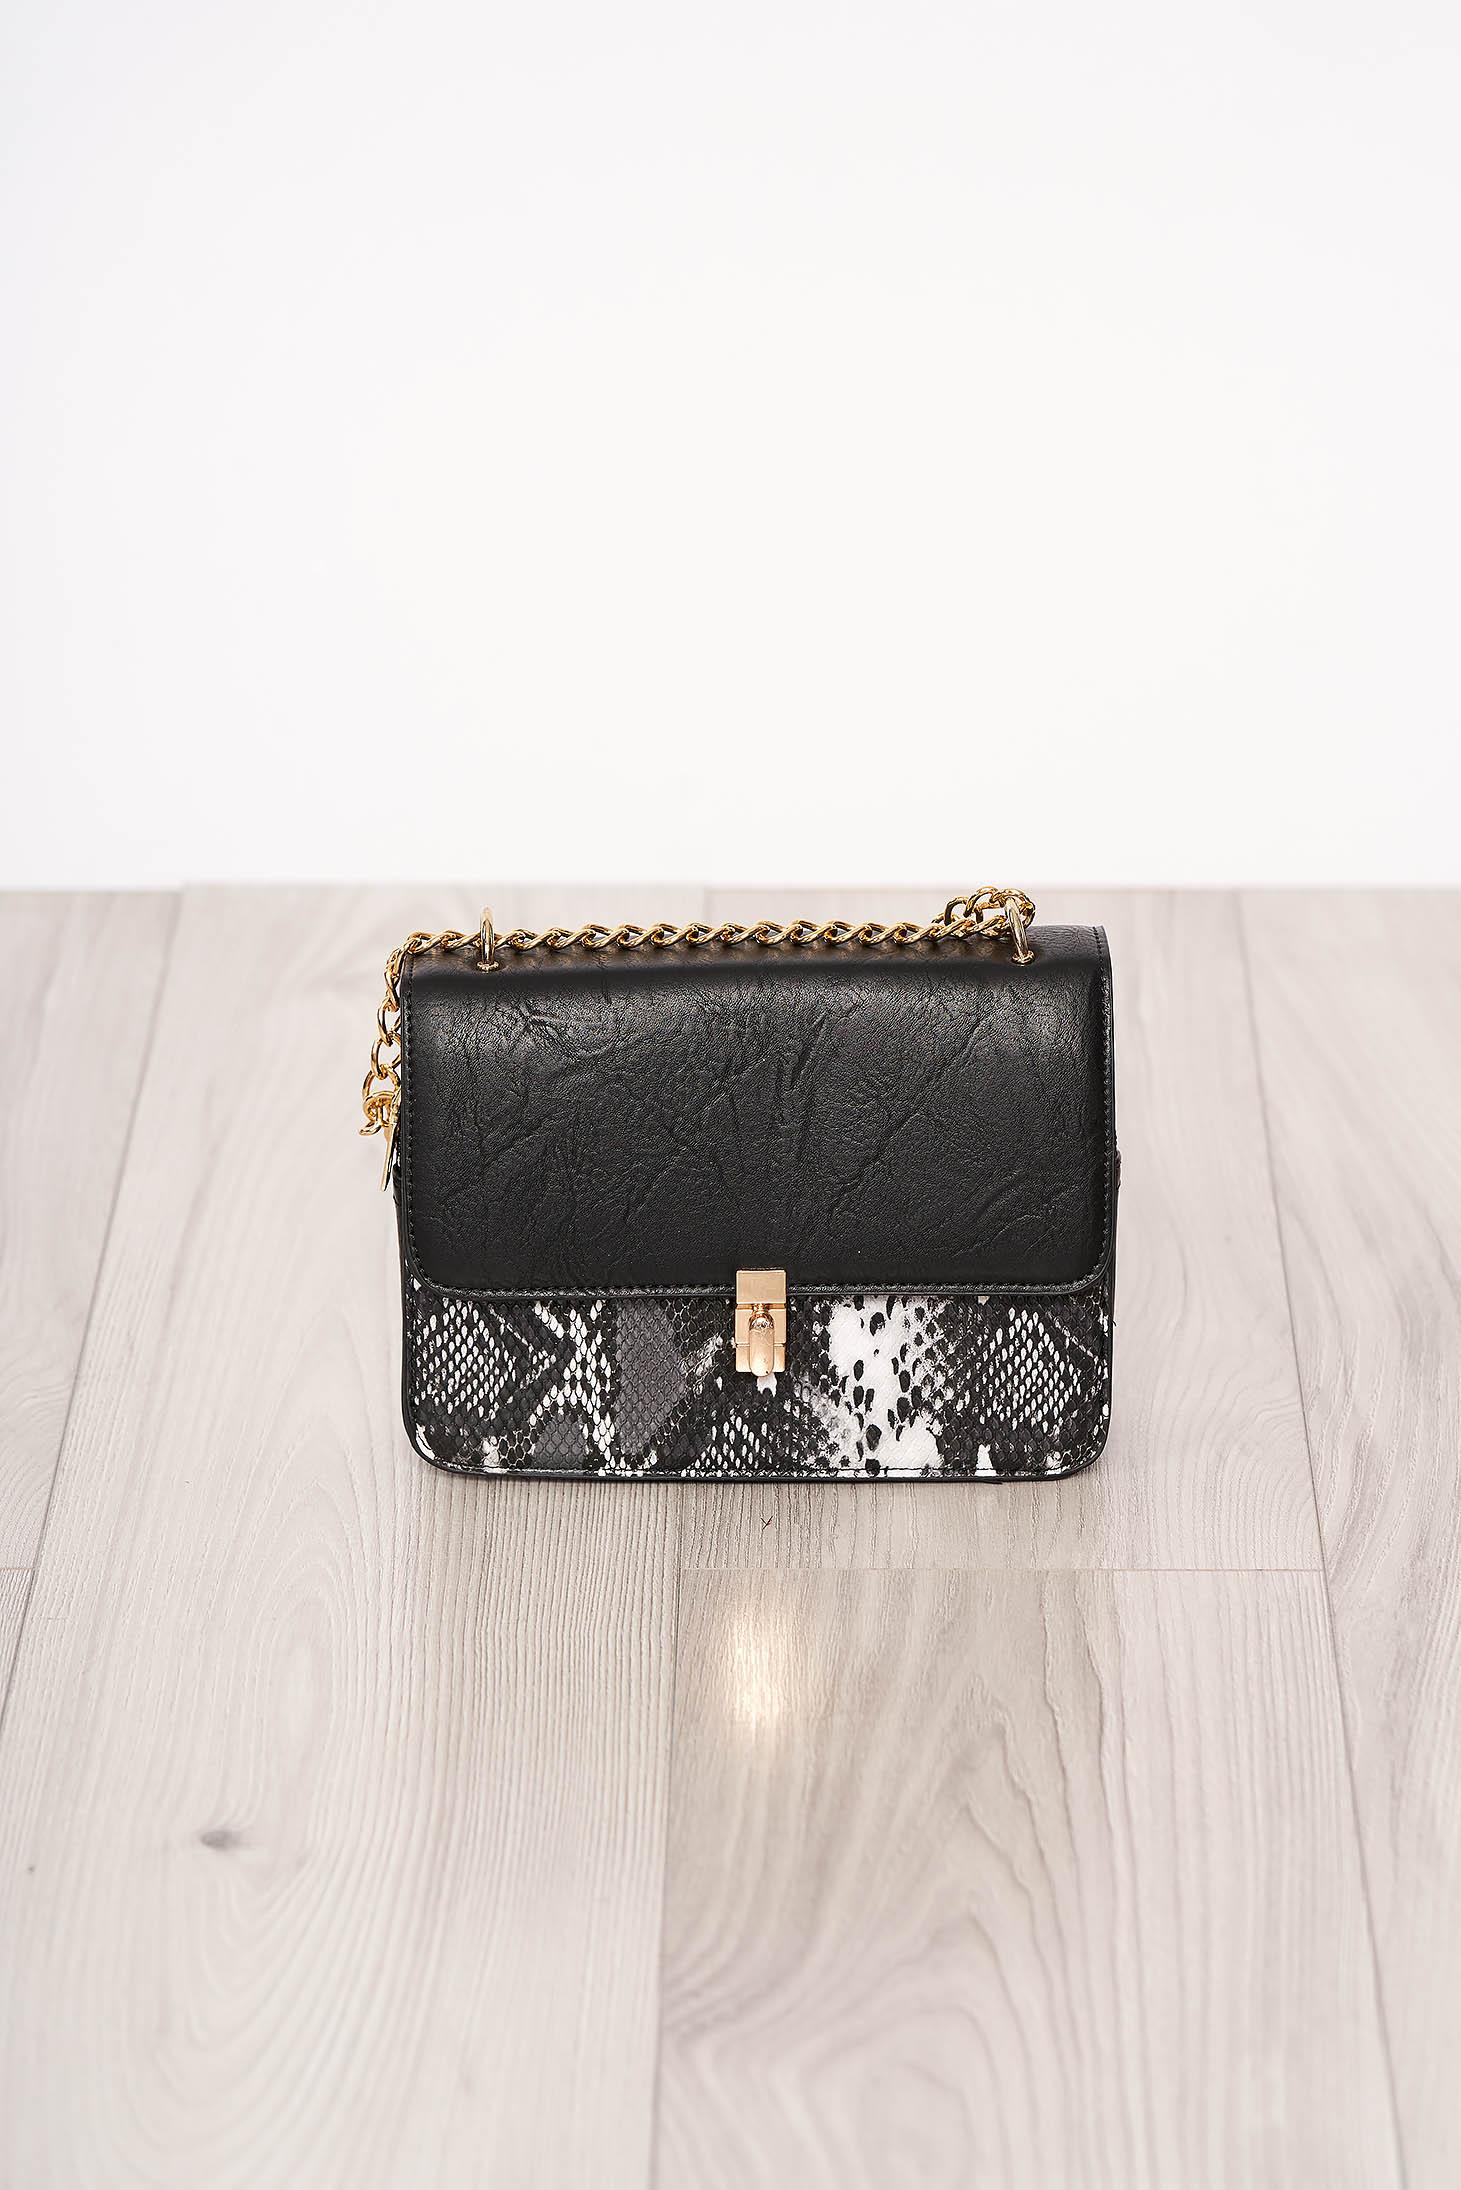 Geanta dama SunShine neagra din piele ecologica cu animal print cu maner lung tip lantisor si accesorizata cu o catarama